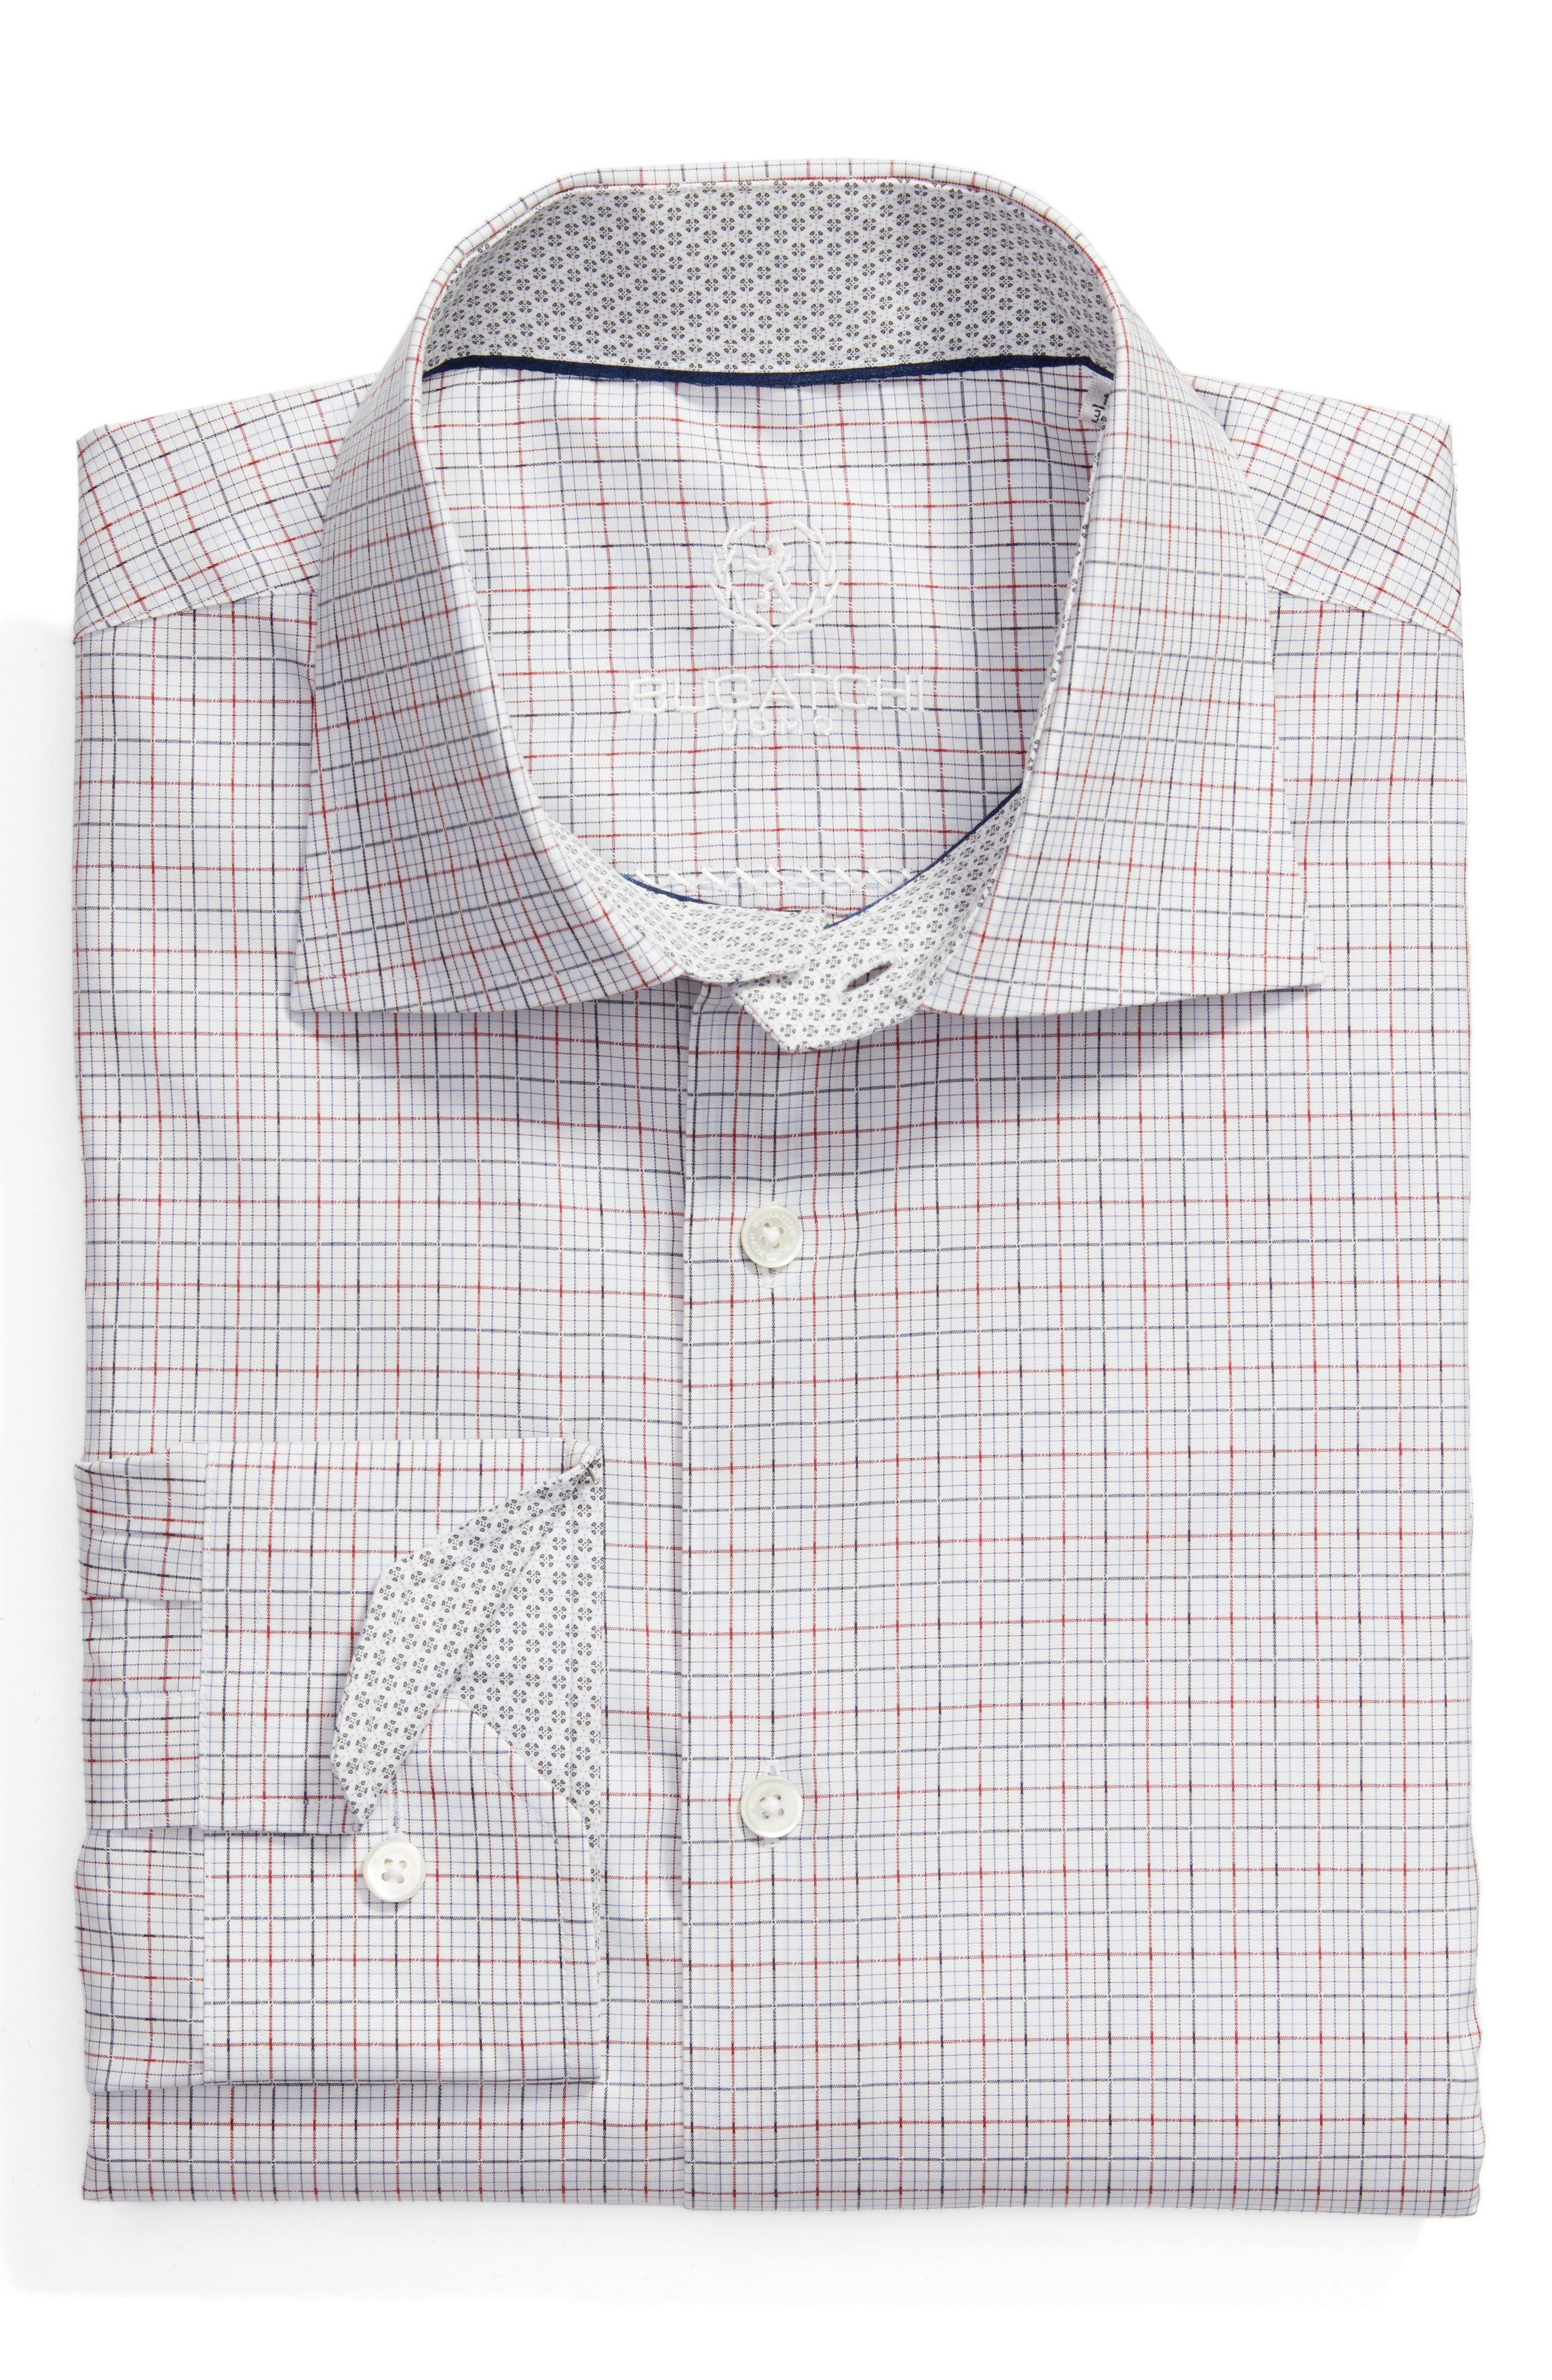 Trim Fit Check Dress Shirt,                             Main thumbnail 1, color,